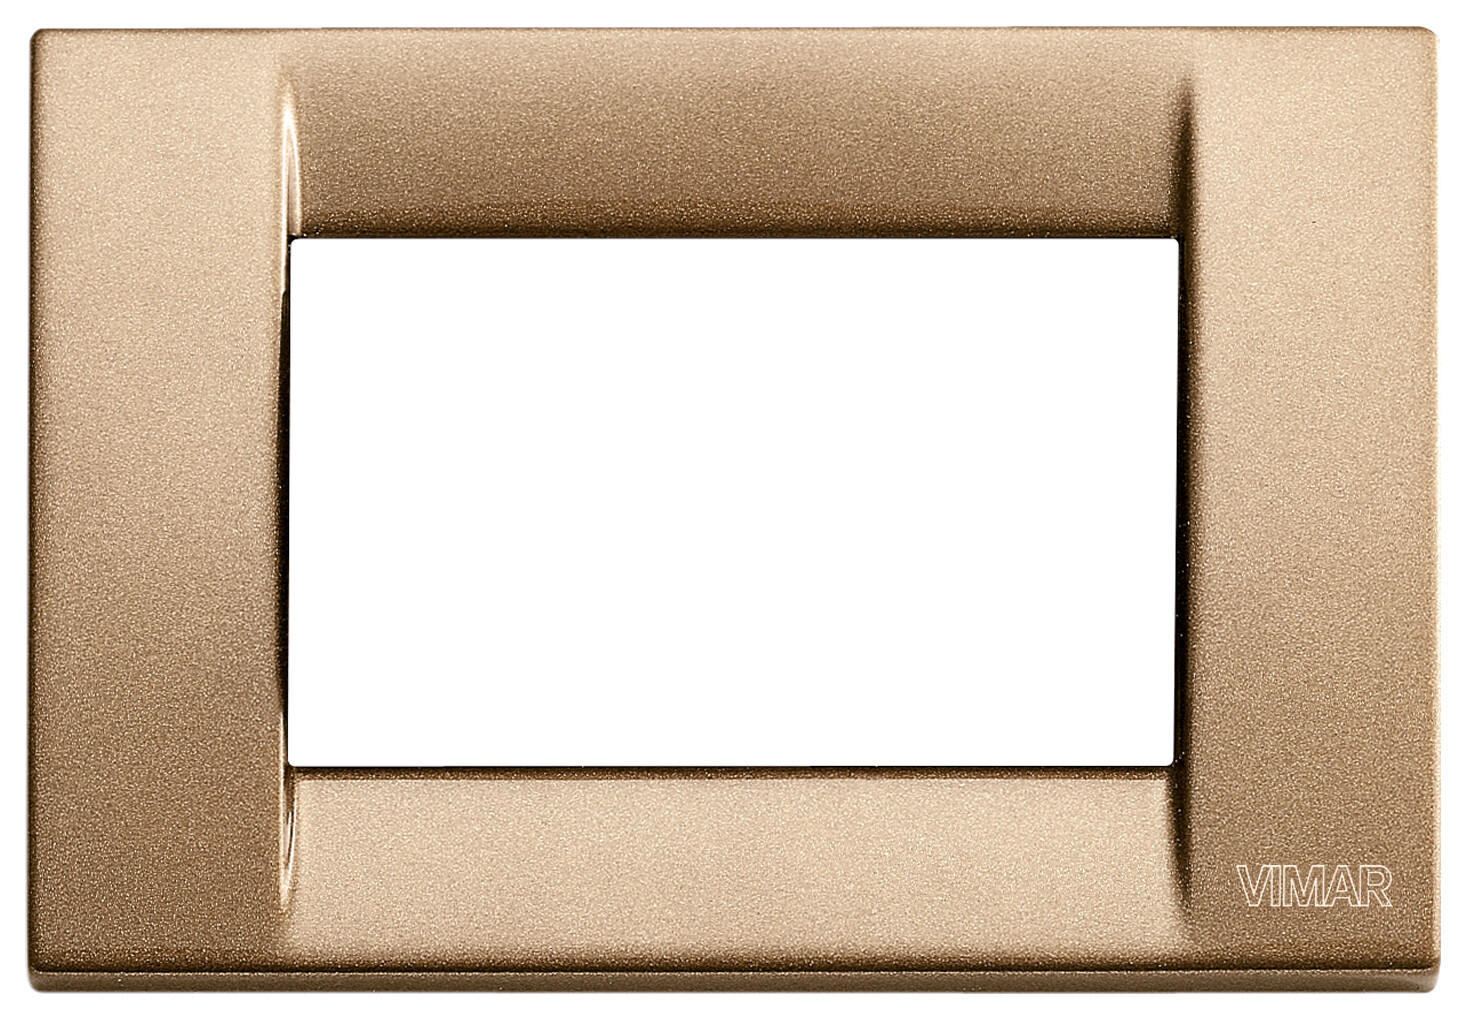 Накладка для 3 модулей металл металлик бронзовый